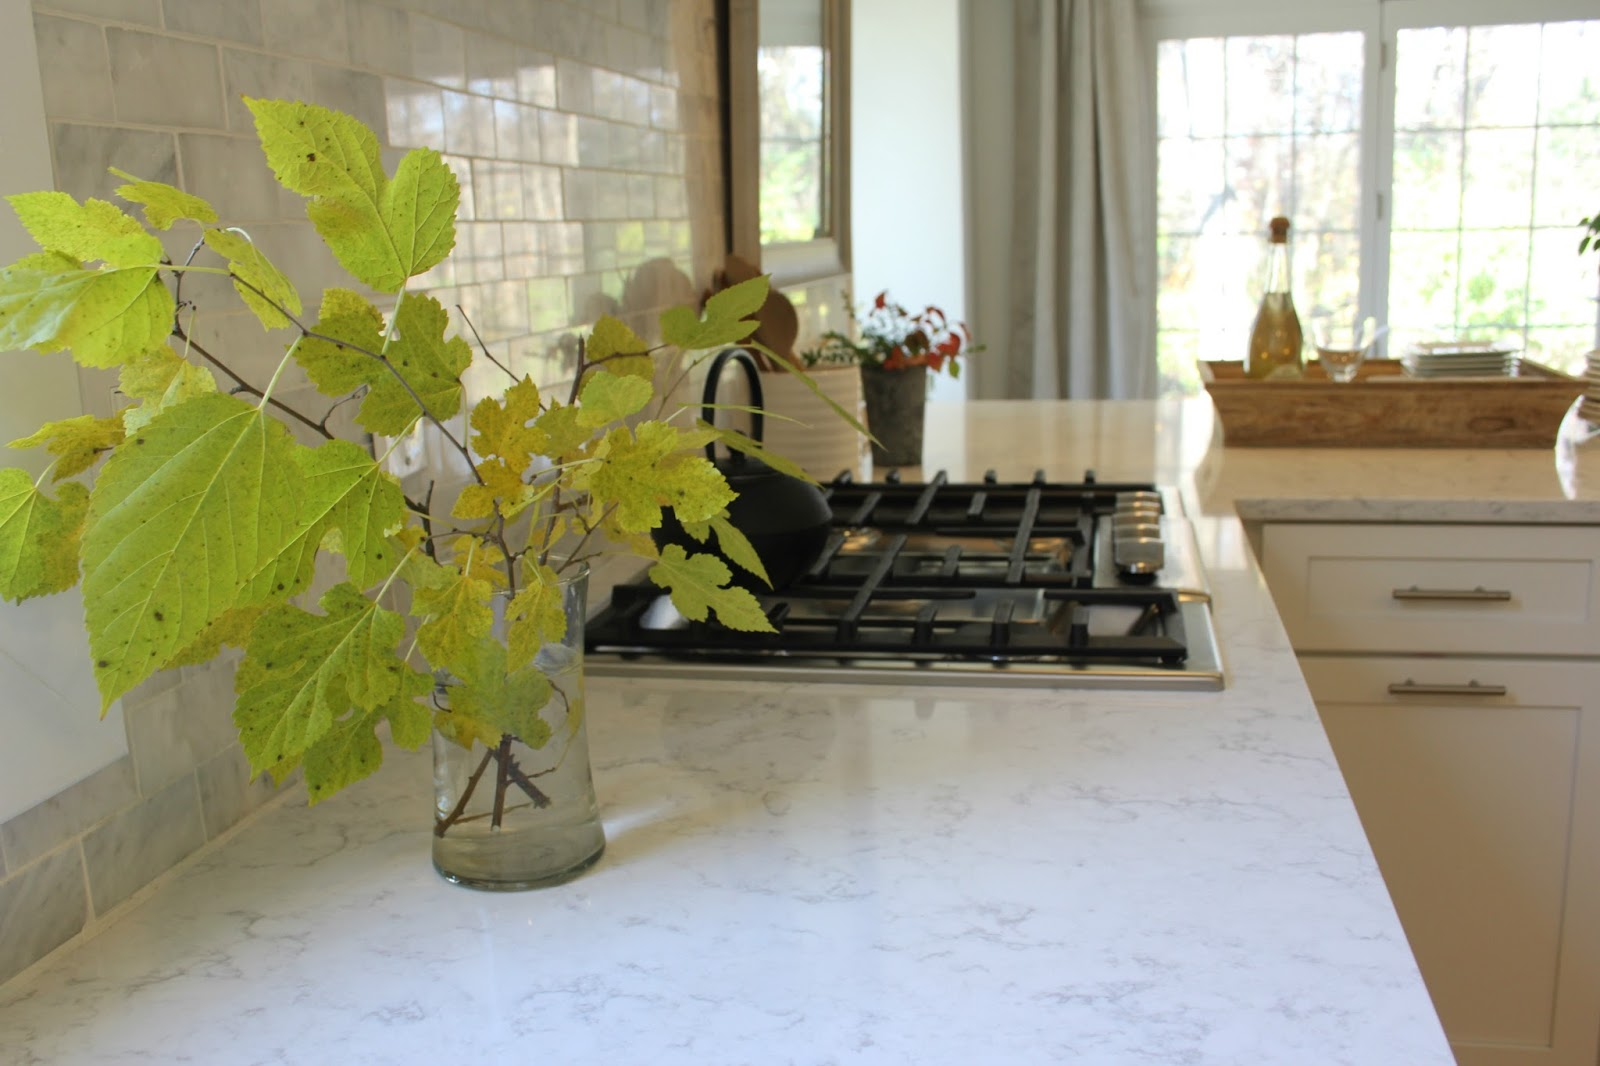 LG Viatera-quartz-Minuet-countertop-white-kitchen-farmhouse-cooktop-branch